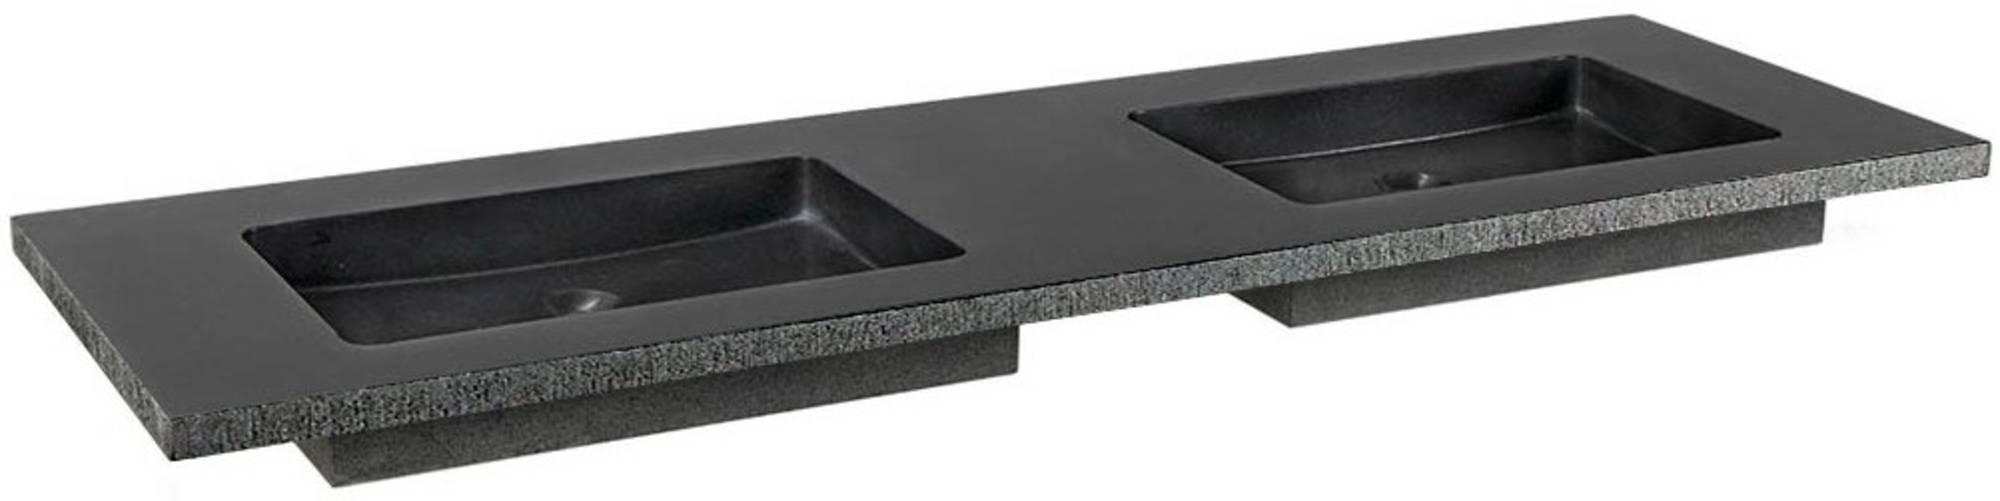 Ben Naturno Wastafel Graniet Gezoet Gefrijnd 140,5x51,5x3 cm zonder Krg. Zwart